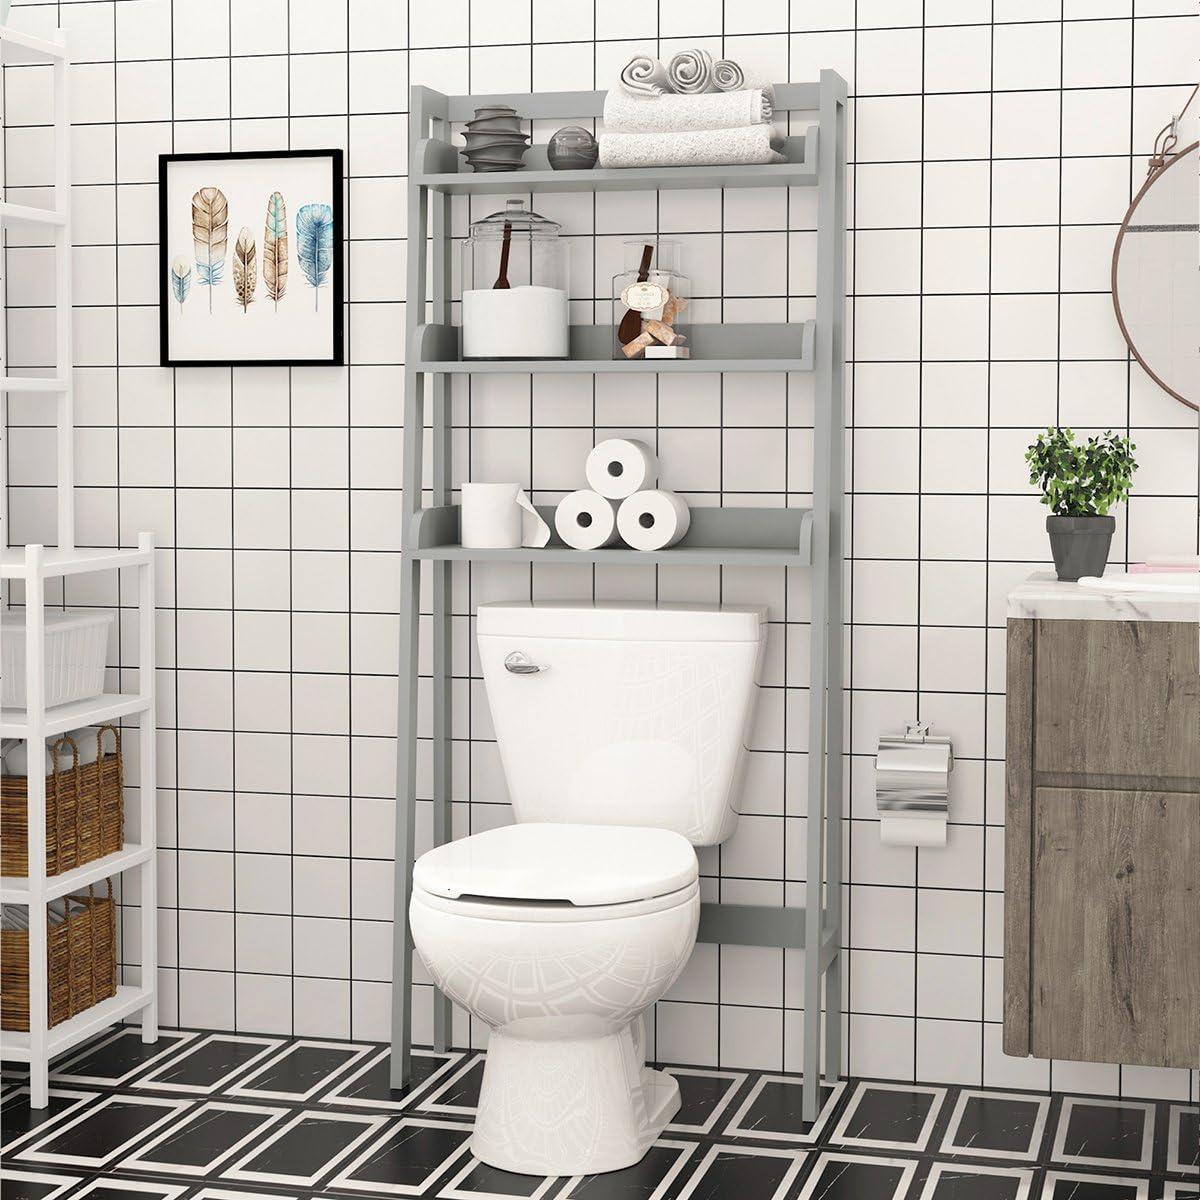 Amazon Com Utex 3 Shelf Bathroom Organizer Over The Toilet Bathroom Spacesaver Gray Kitchen Dining